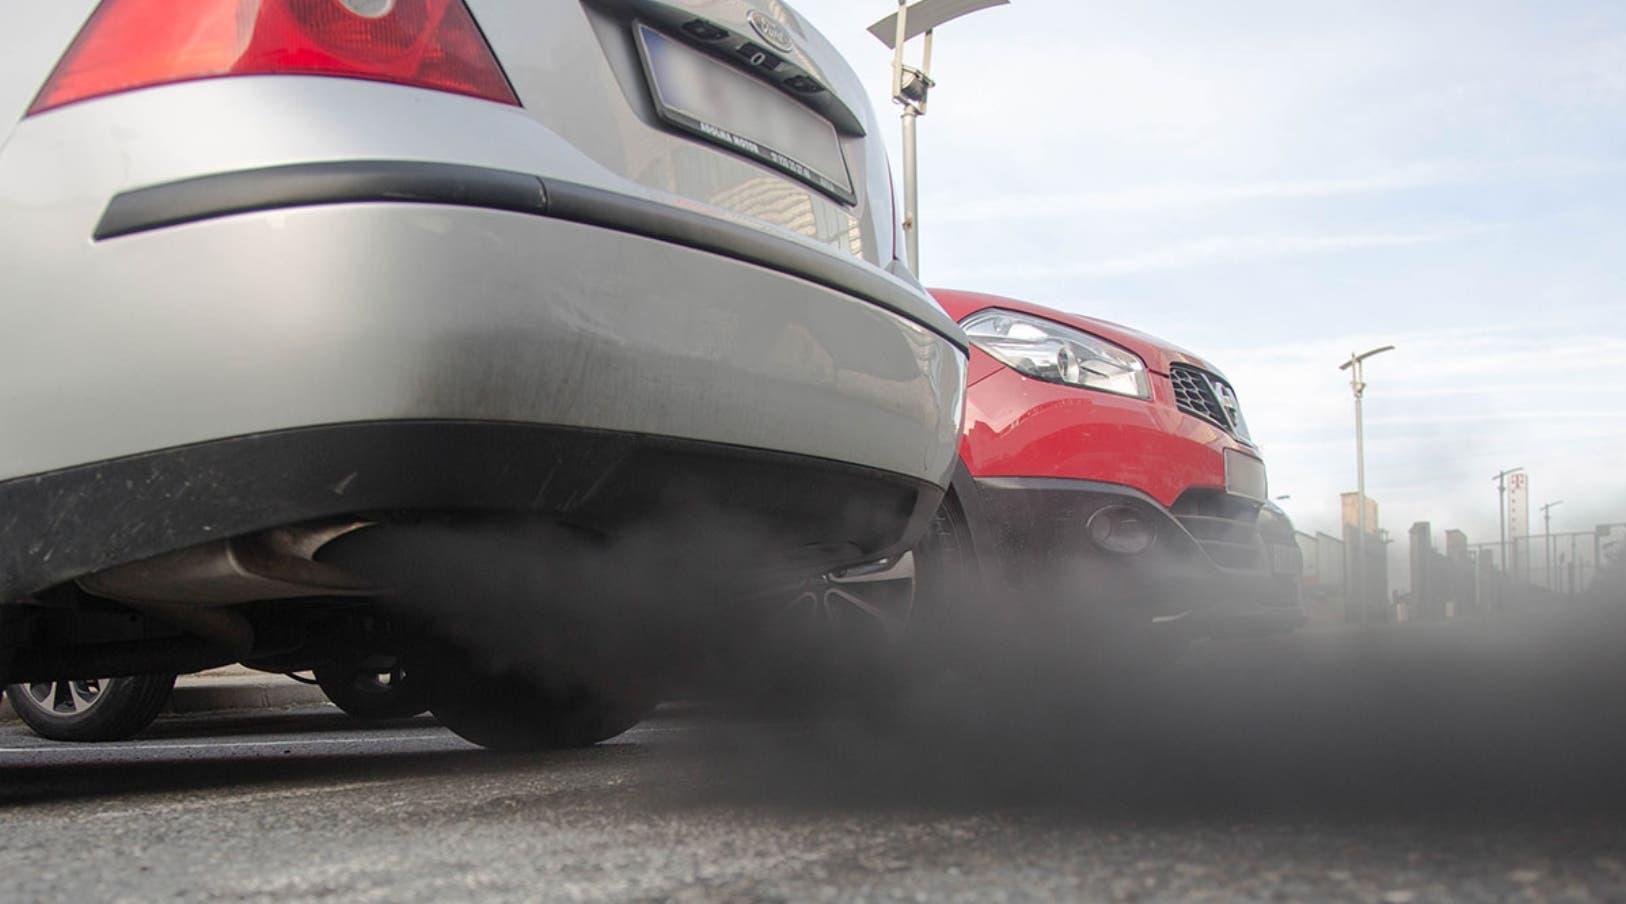 Calidad del aire se mide a través de contaminantes